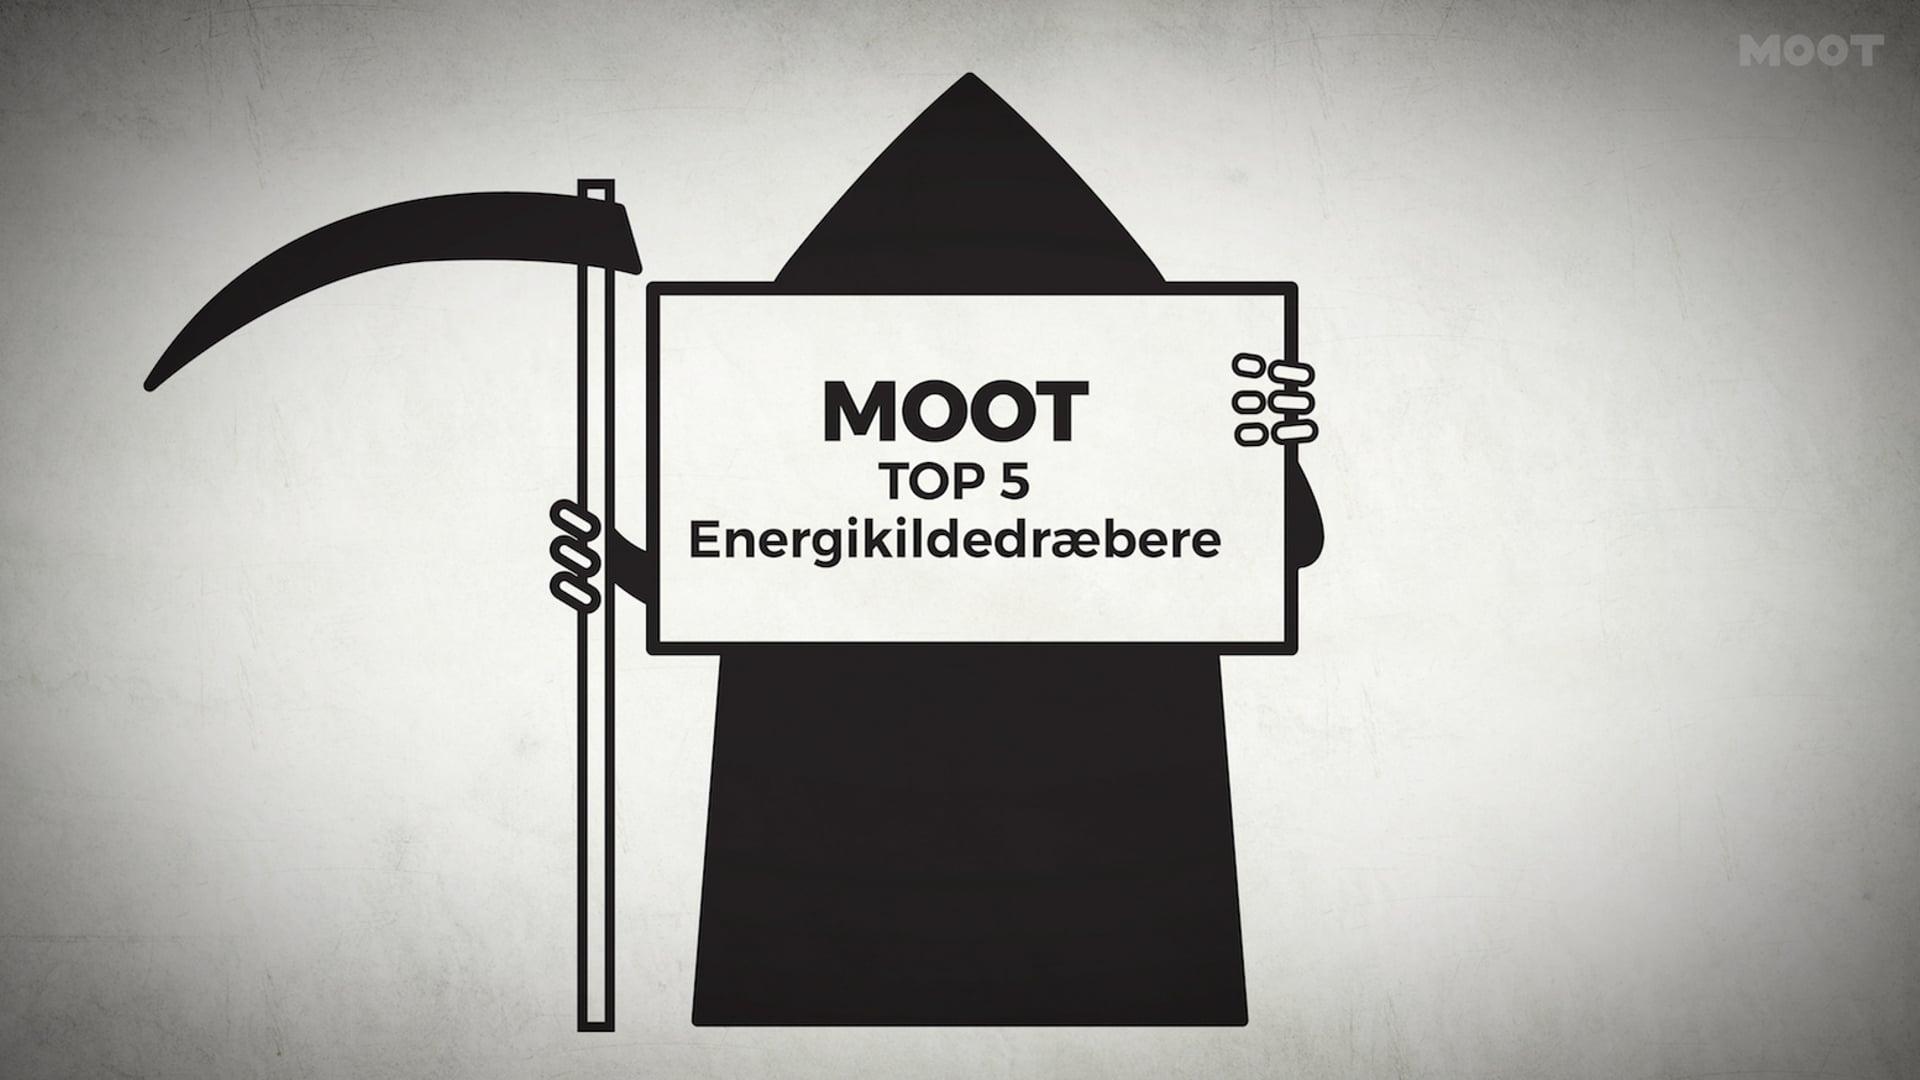 Energikilde-dræbere